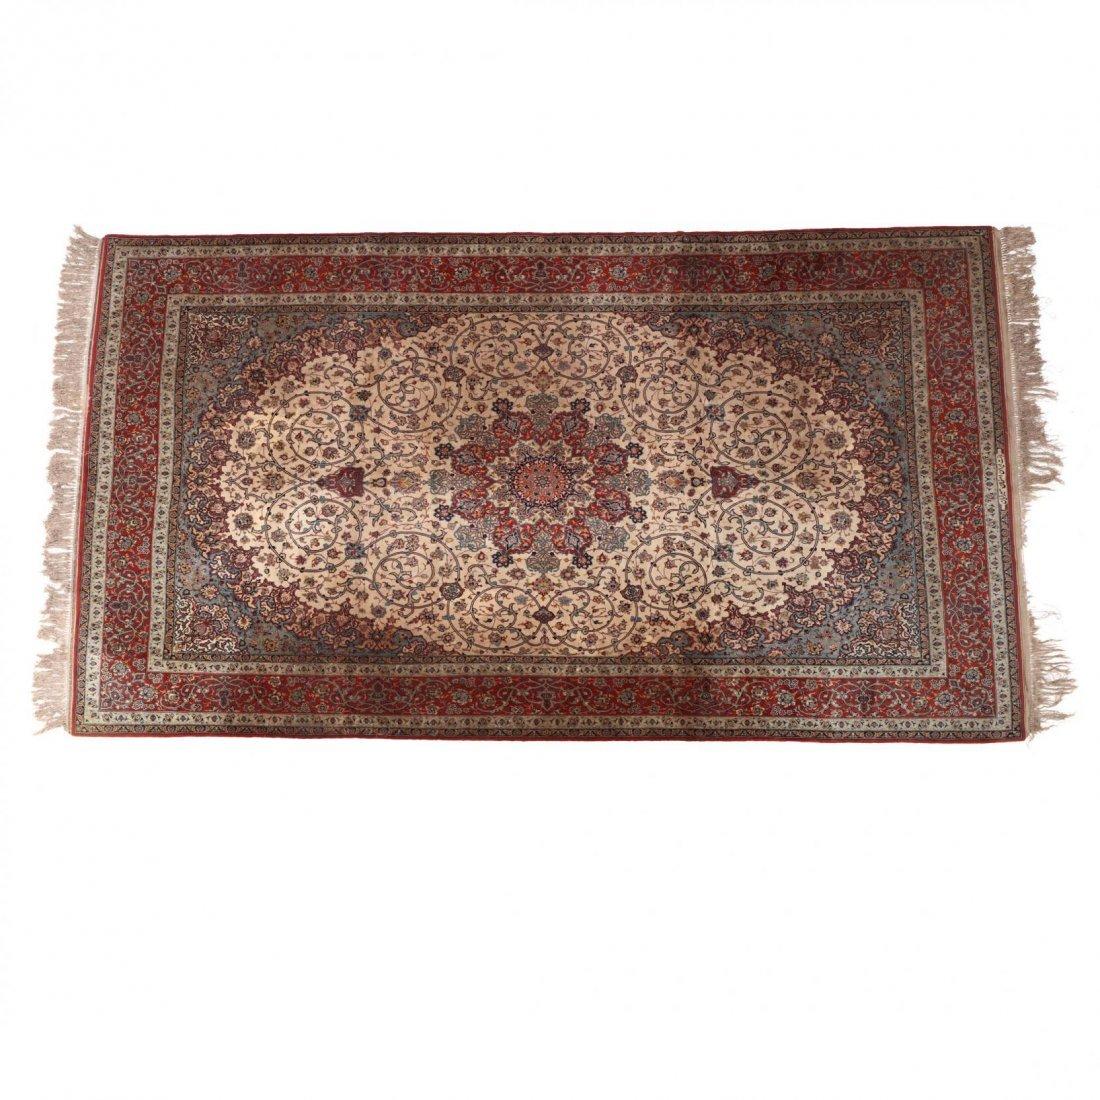 Persian Seirafian Isfahan Carpet, signed